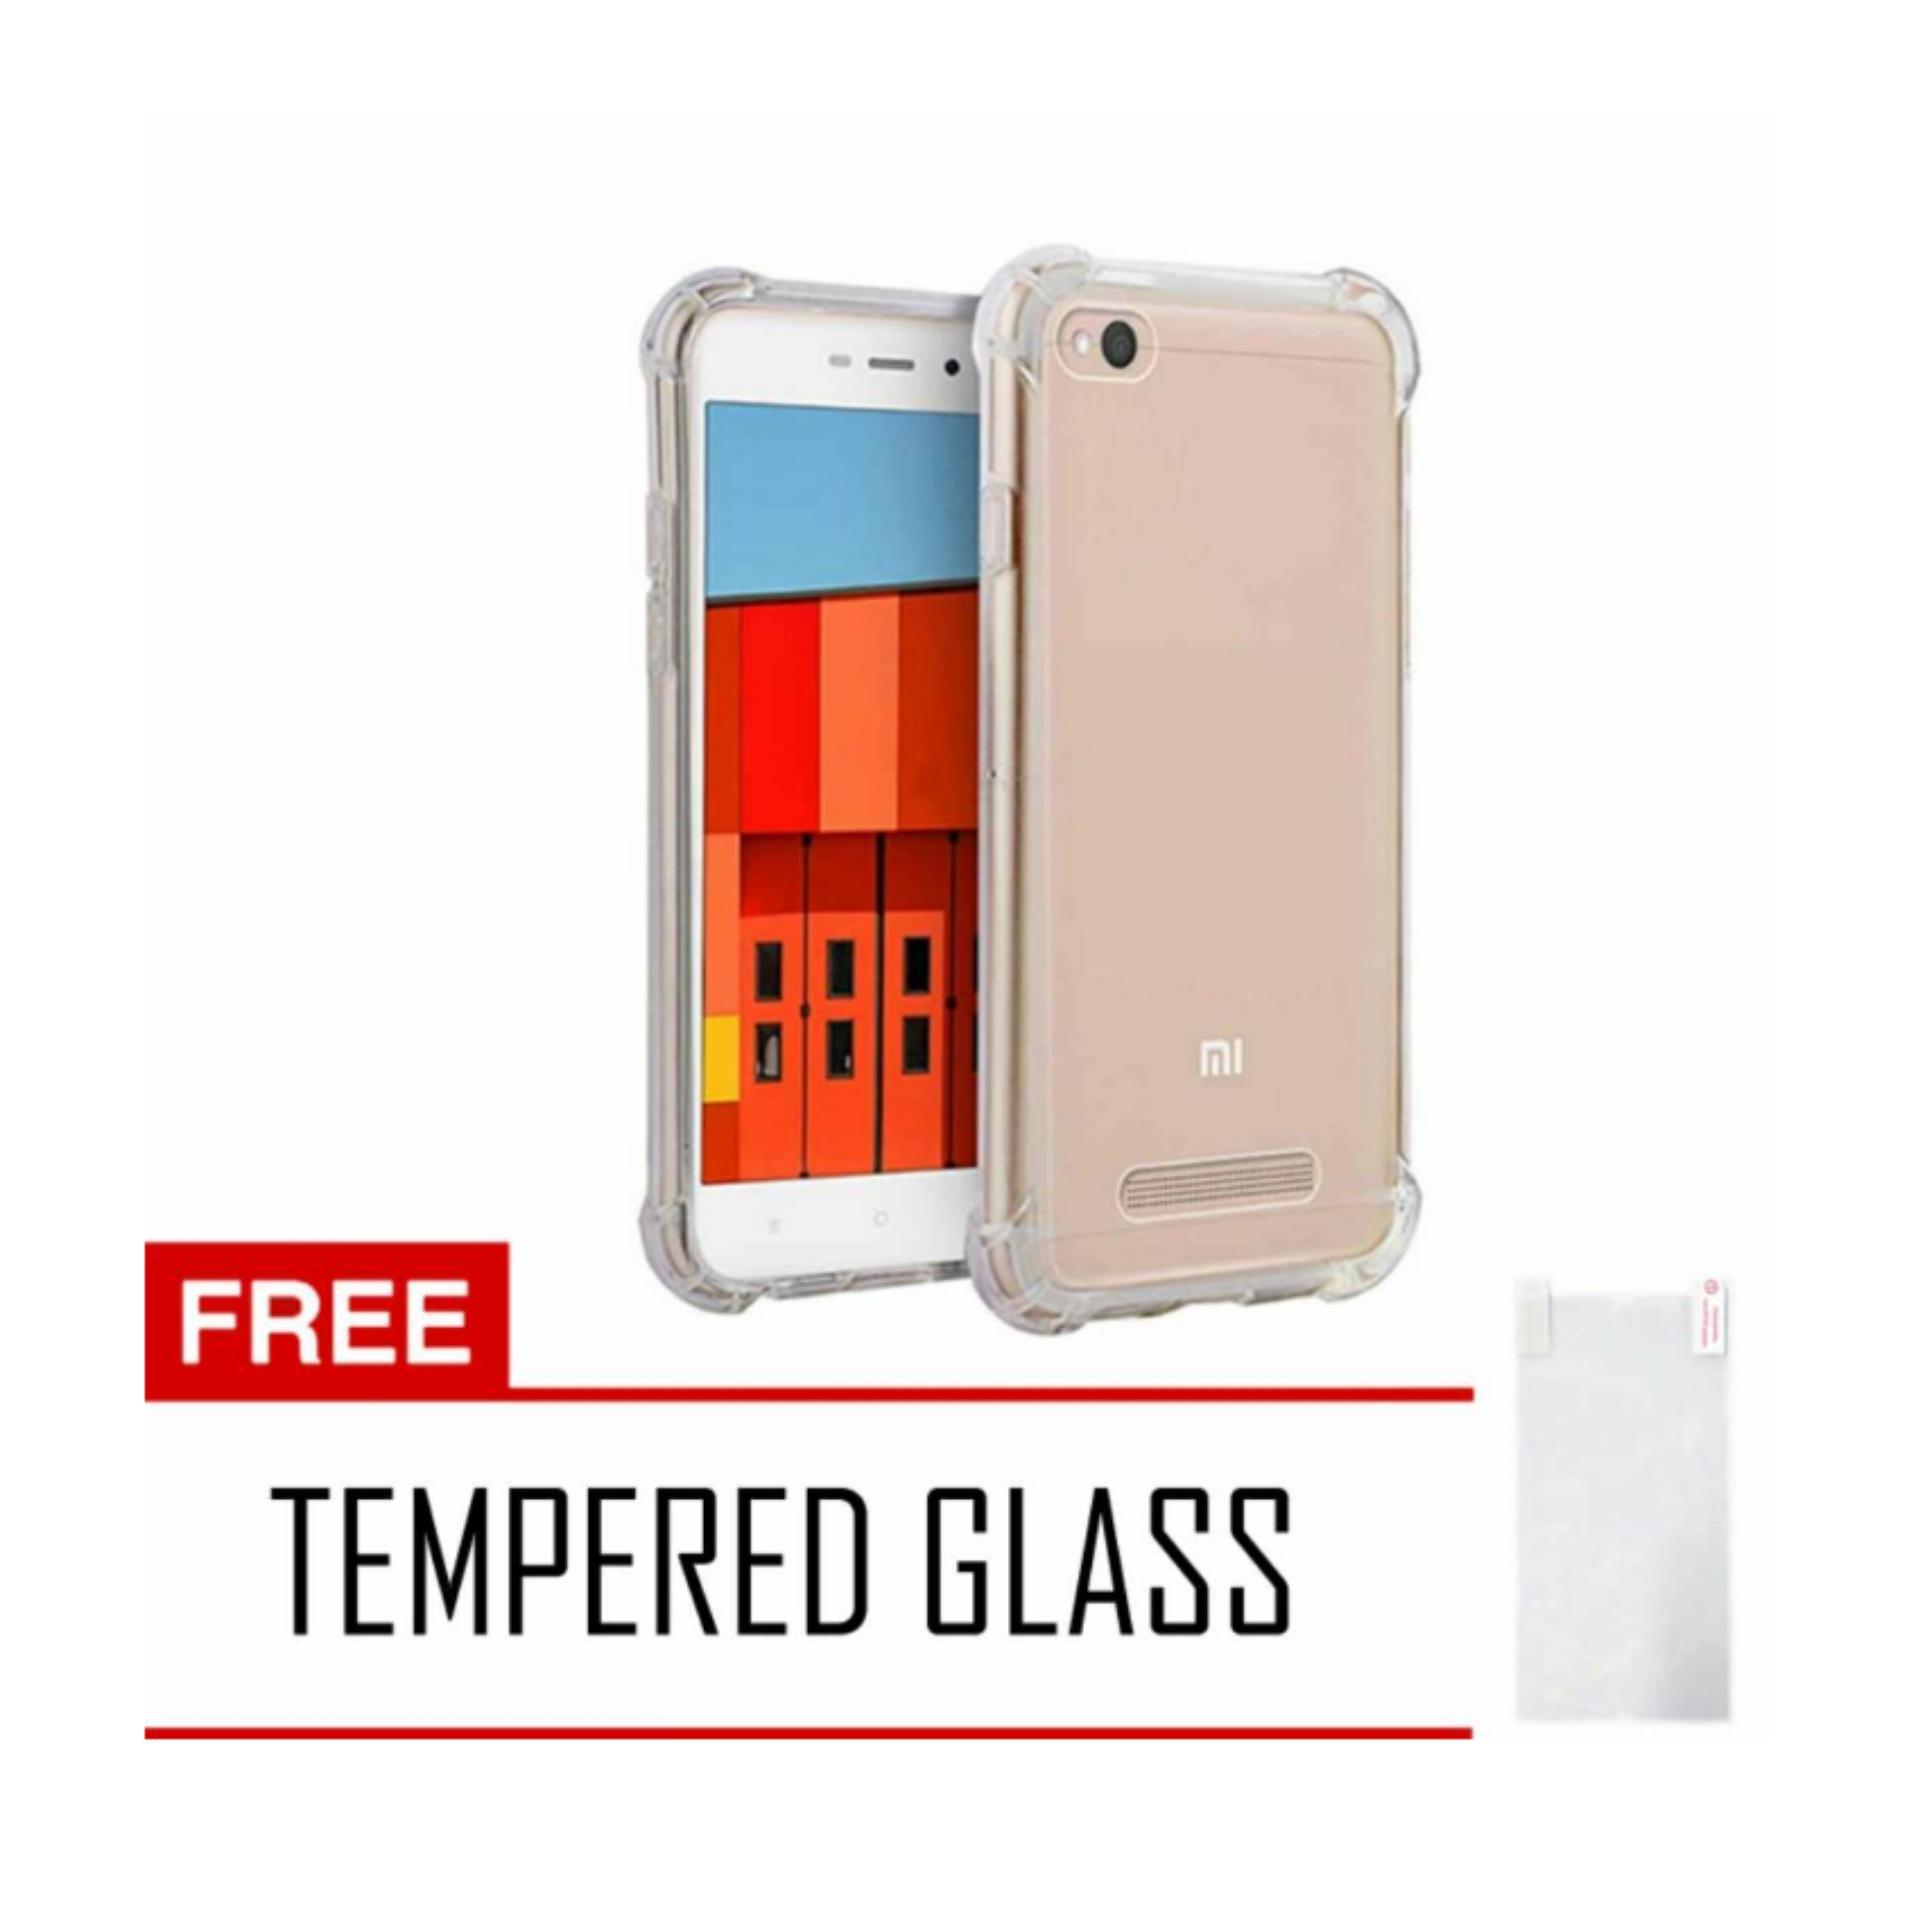 Kelebihan Case 9star For Xiaomi Redmi 4a Softcase Anti Crack Shock Elegant Free Tempered